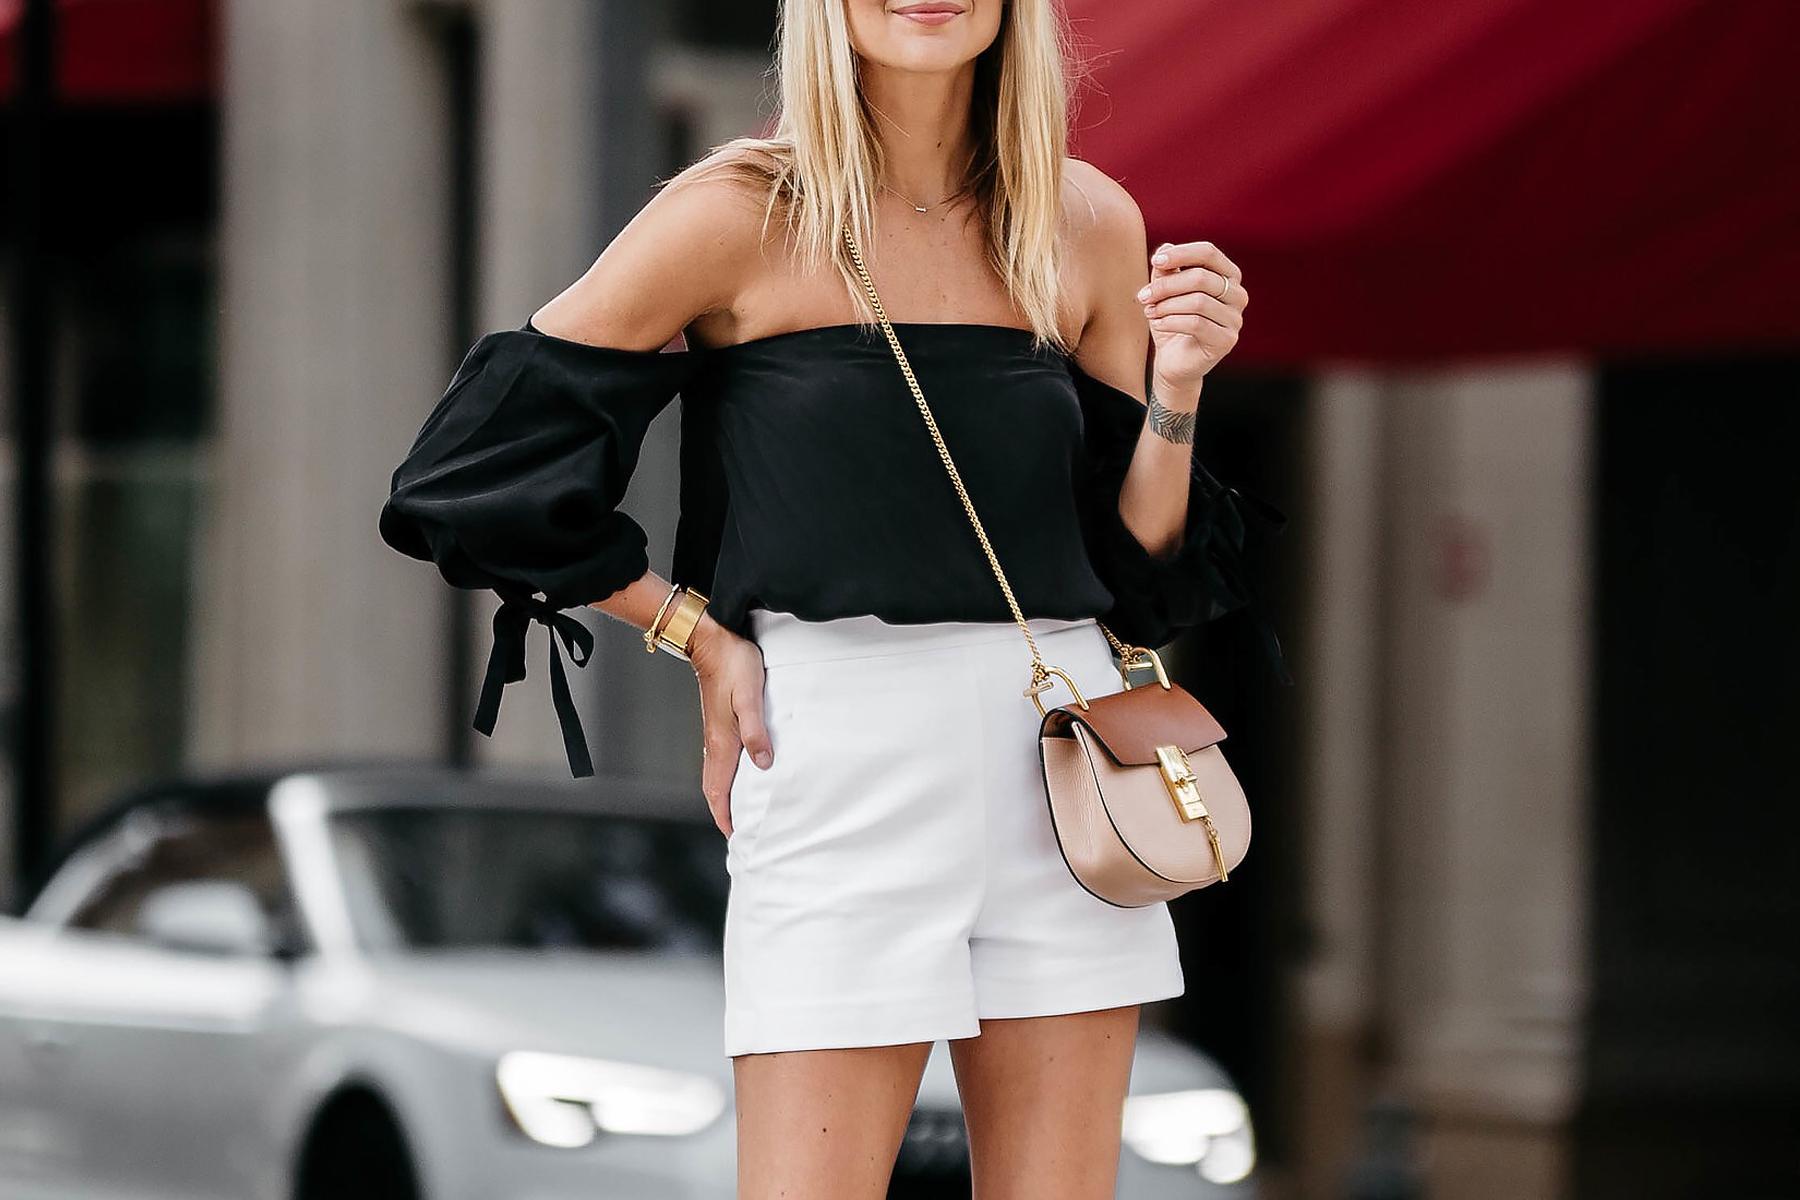 Fashion Jackson, Dallas Blogger, Fashion Blogger, Street Style, Club Monaco Black Off-the-Shoulder Top, White High Waisted Shorts, Chloe Drew Handbag, Tan Ankle Strap Bow Heels, Celine Black Sunglasses